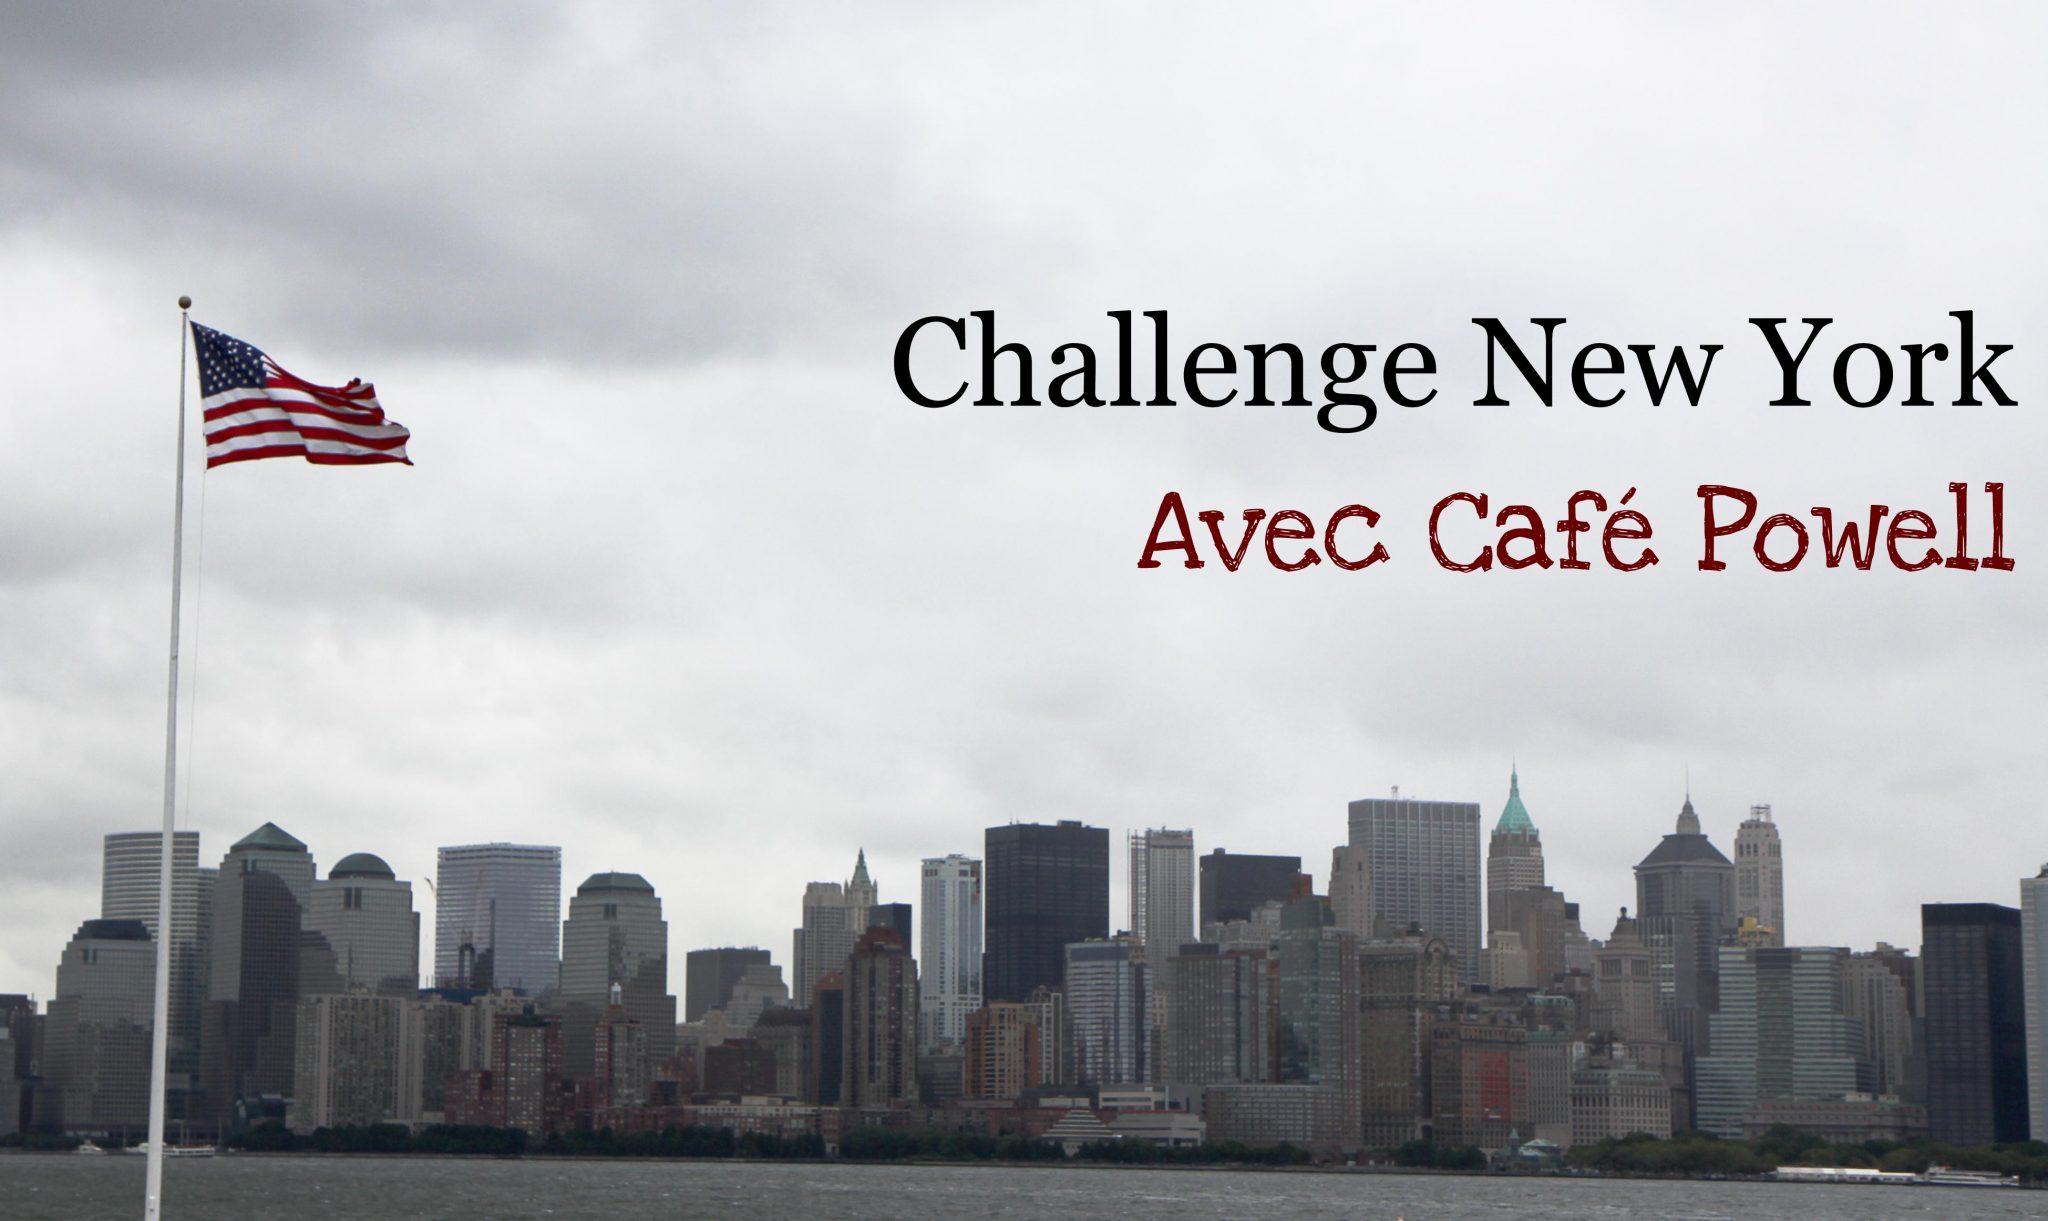 challenge new york café powell - Copie